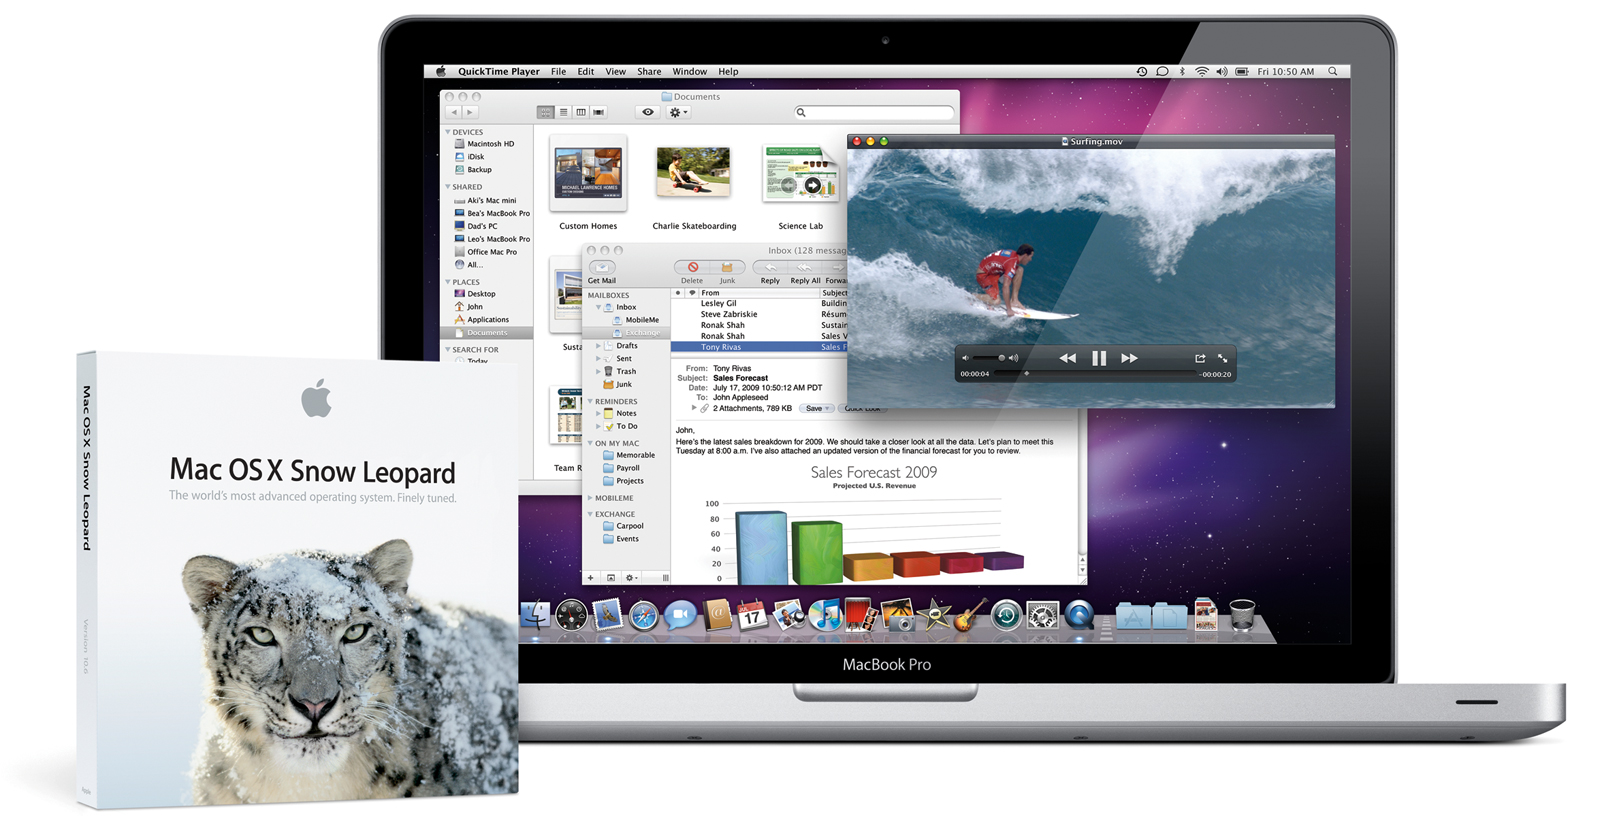 Update For Mac Os X Snow Leopard